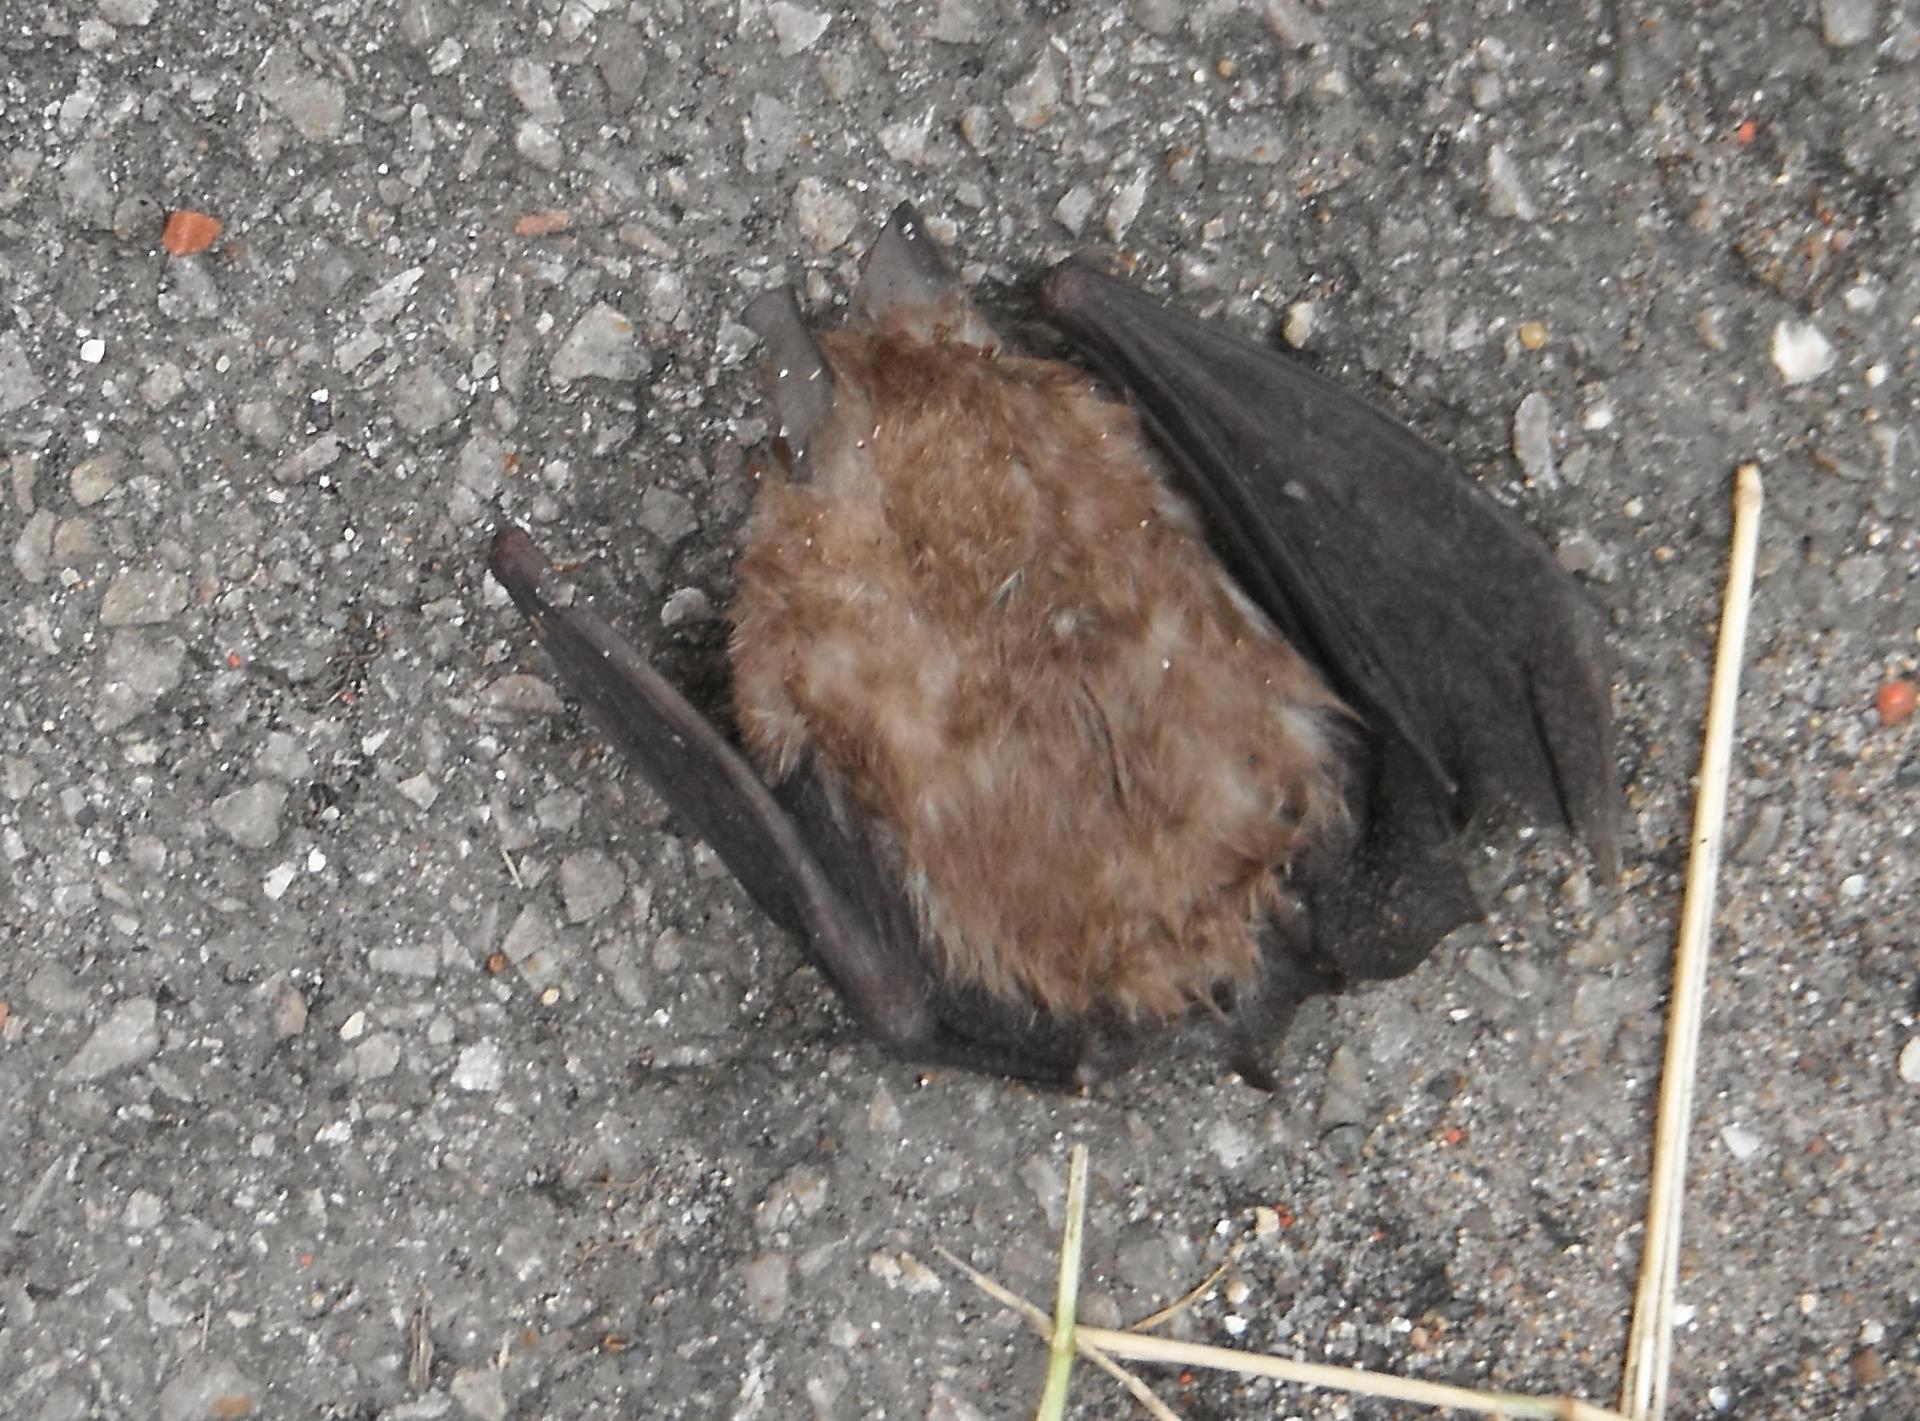 Bat Walk Experiences